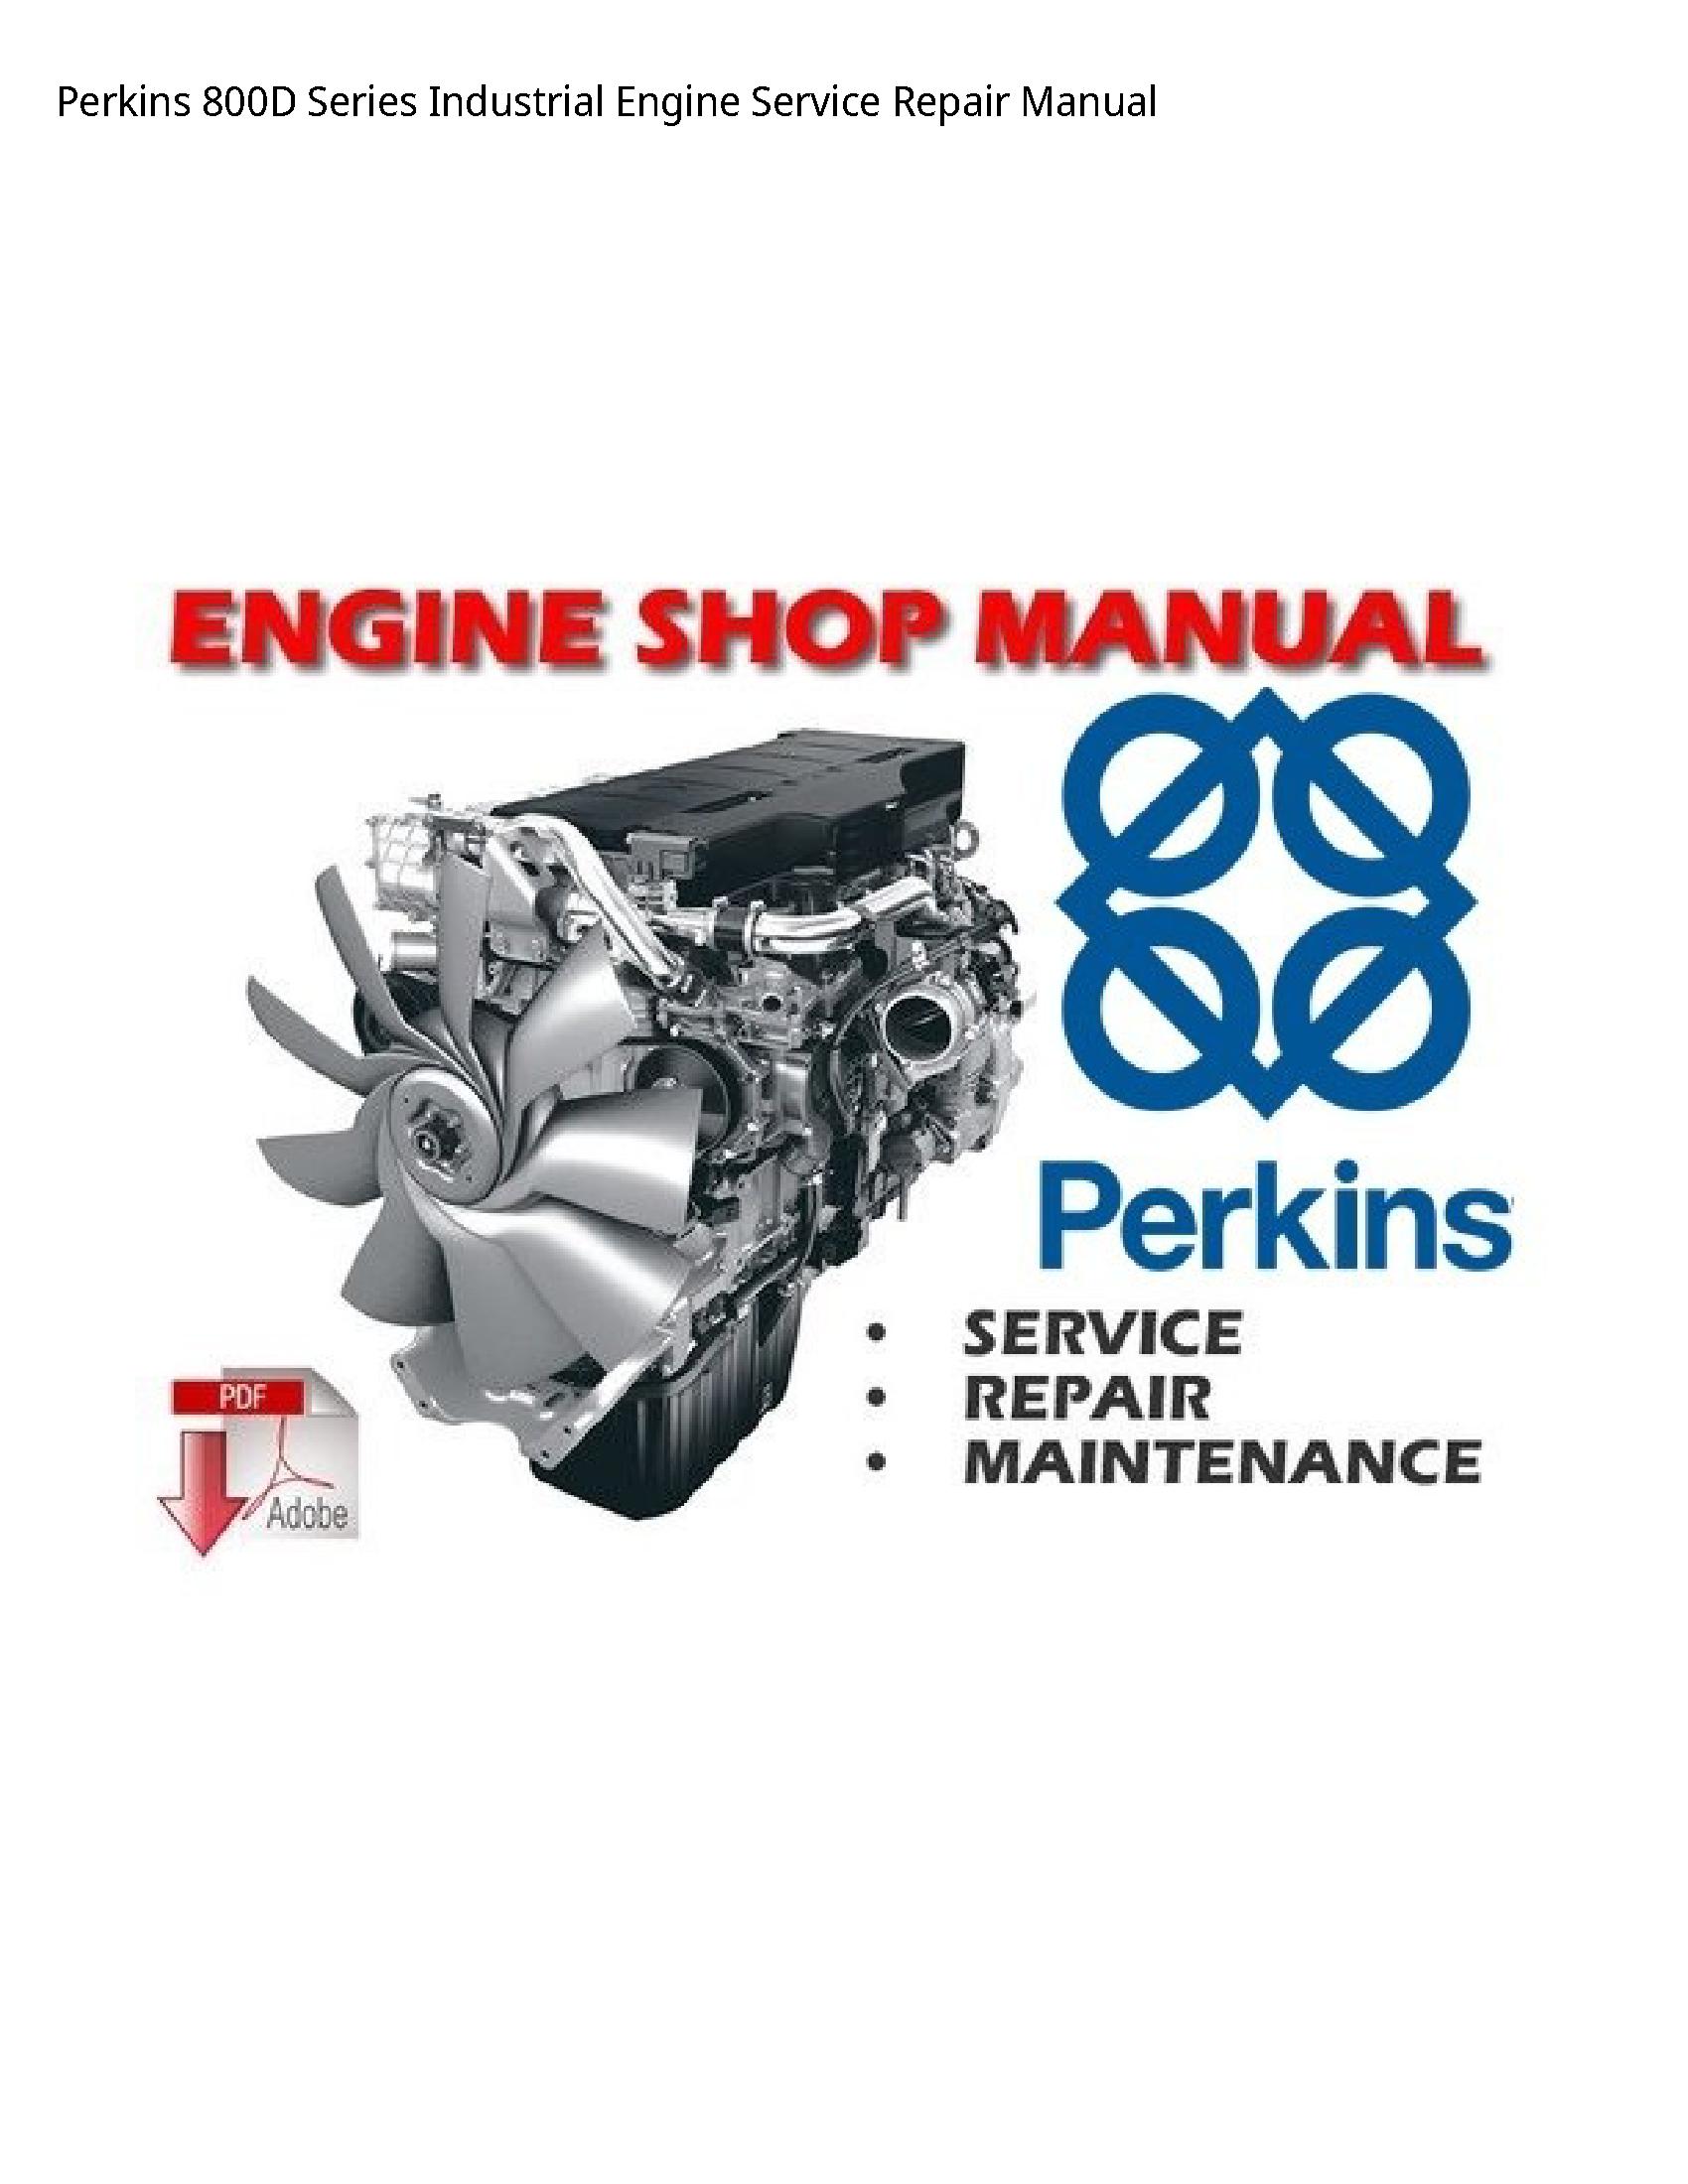 Perkins 800D Series Industrial Engine manual